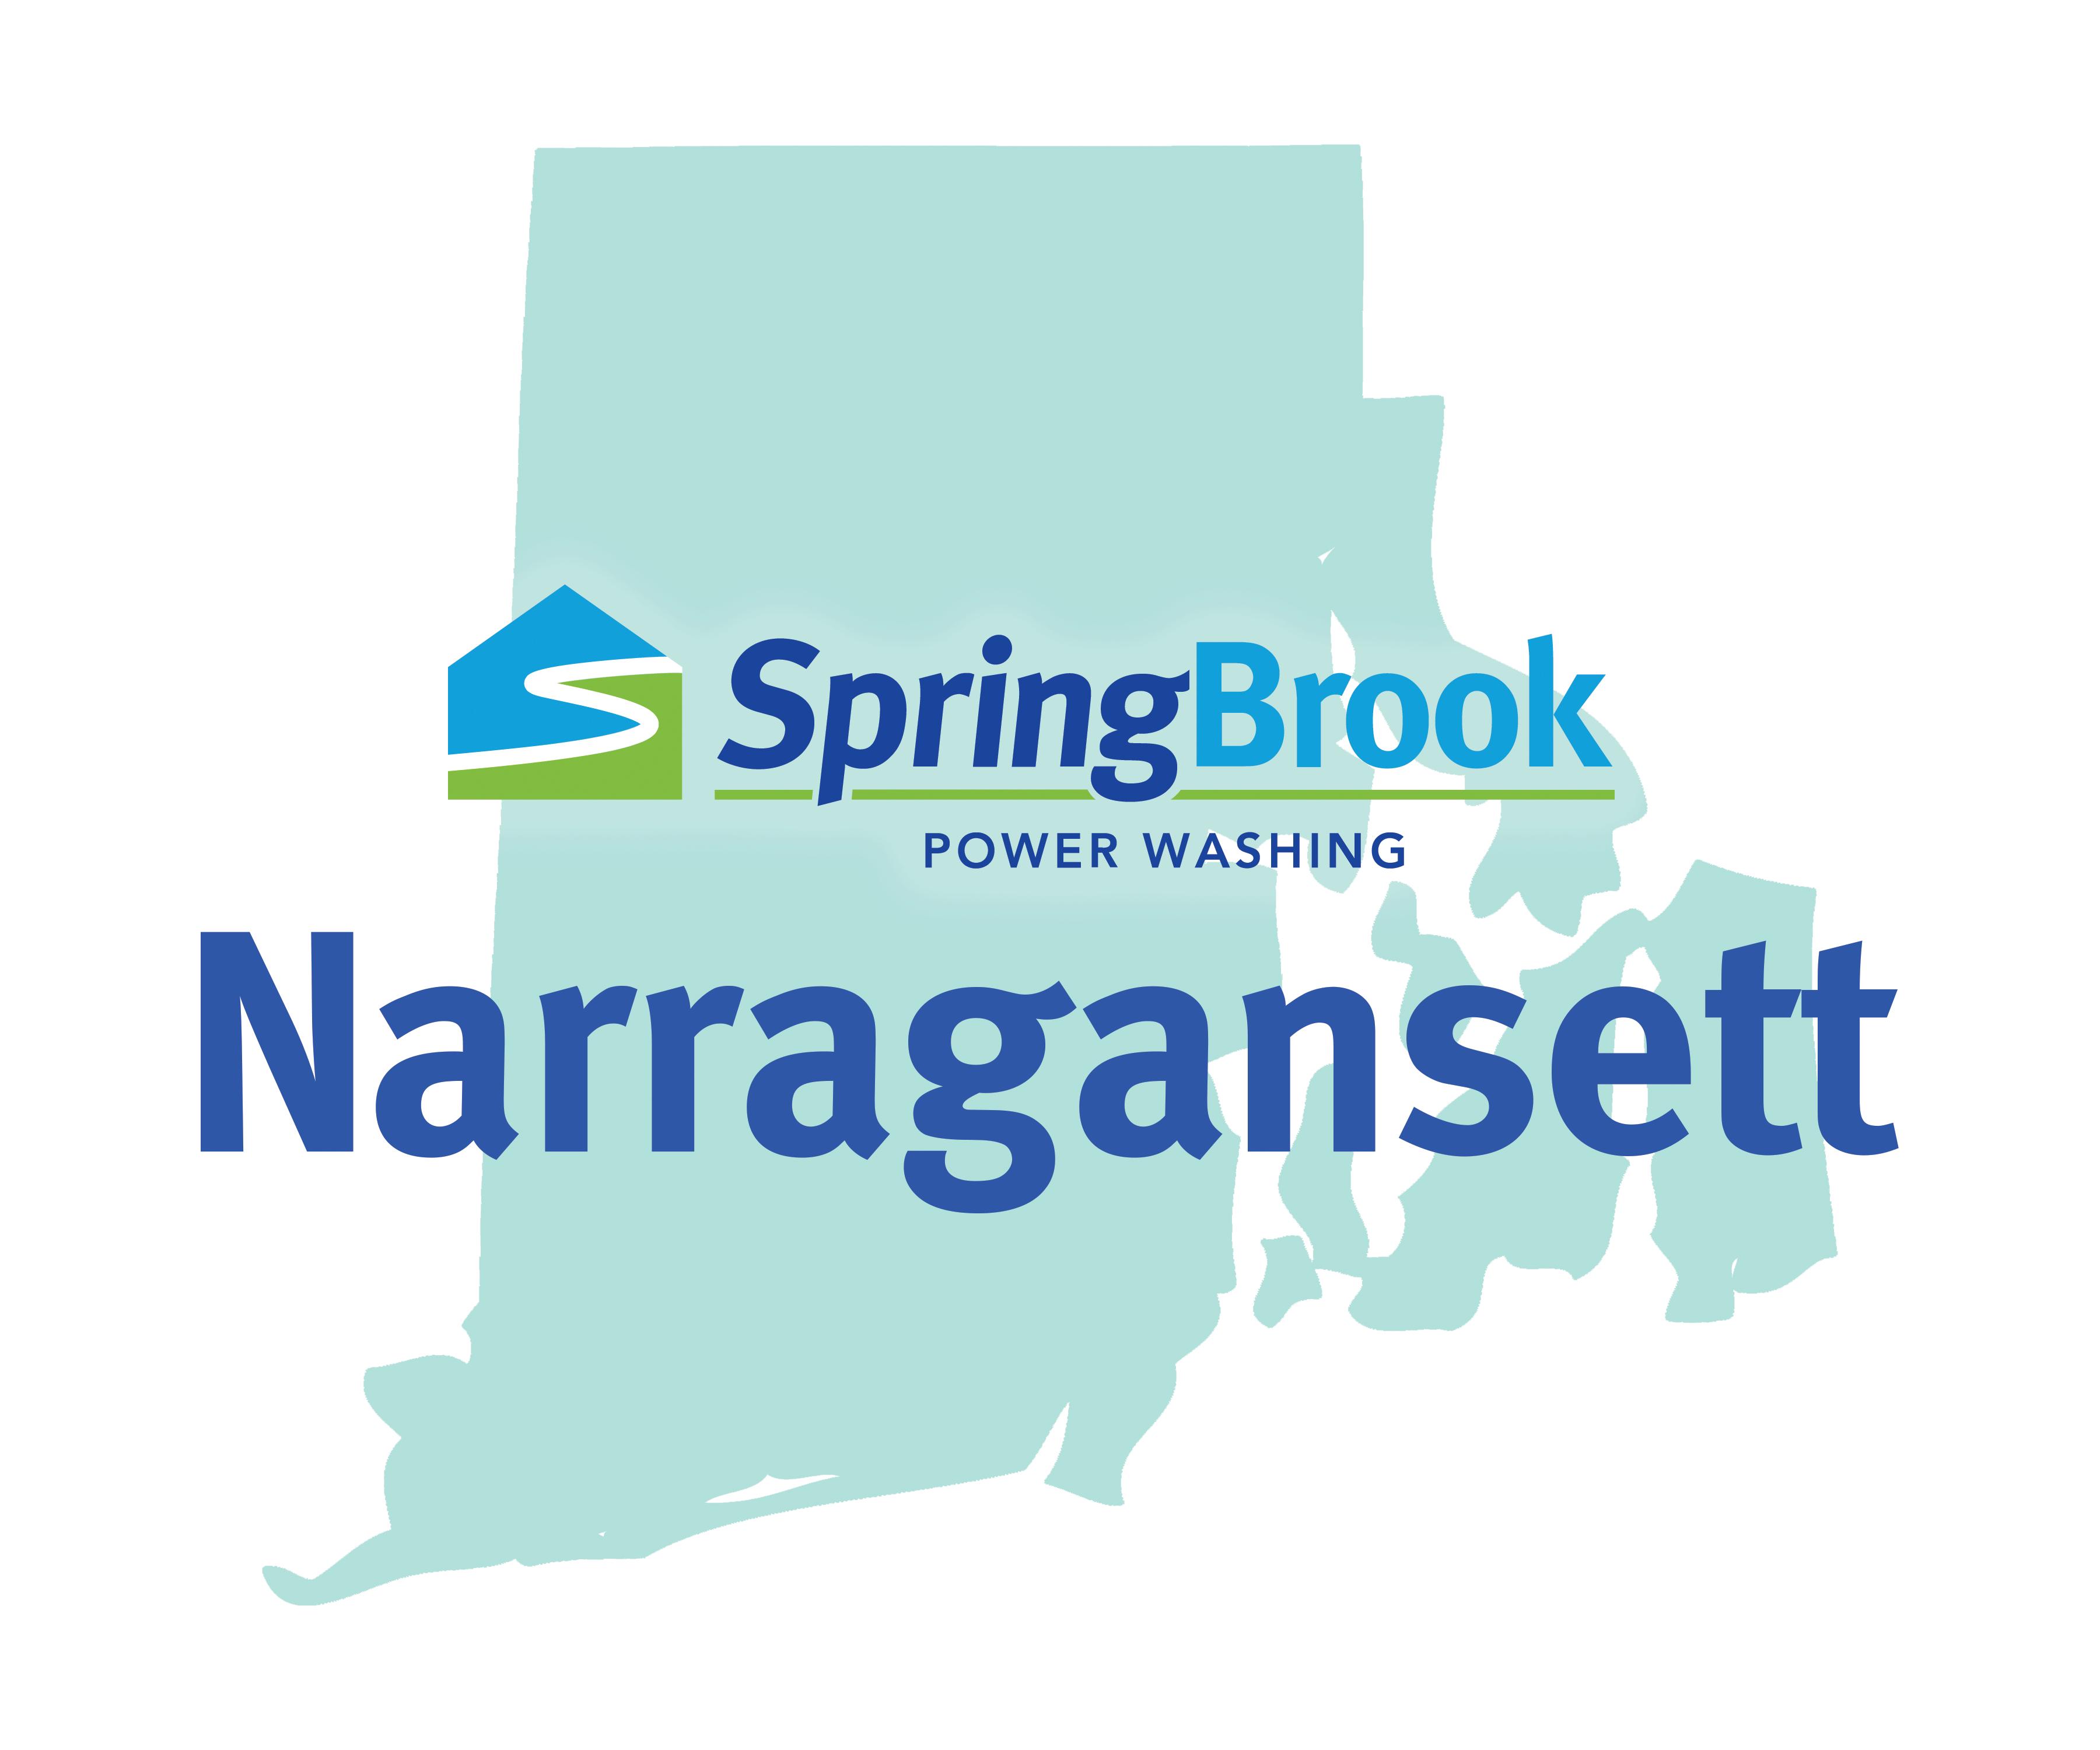 Springbrook Power Washing Narragansett Rhode Island